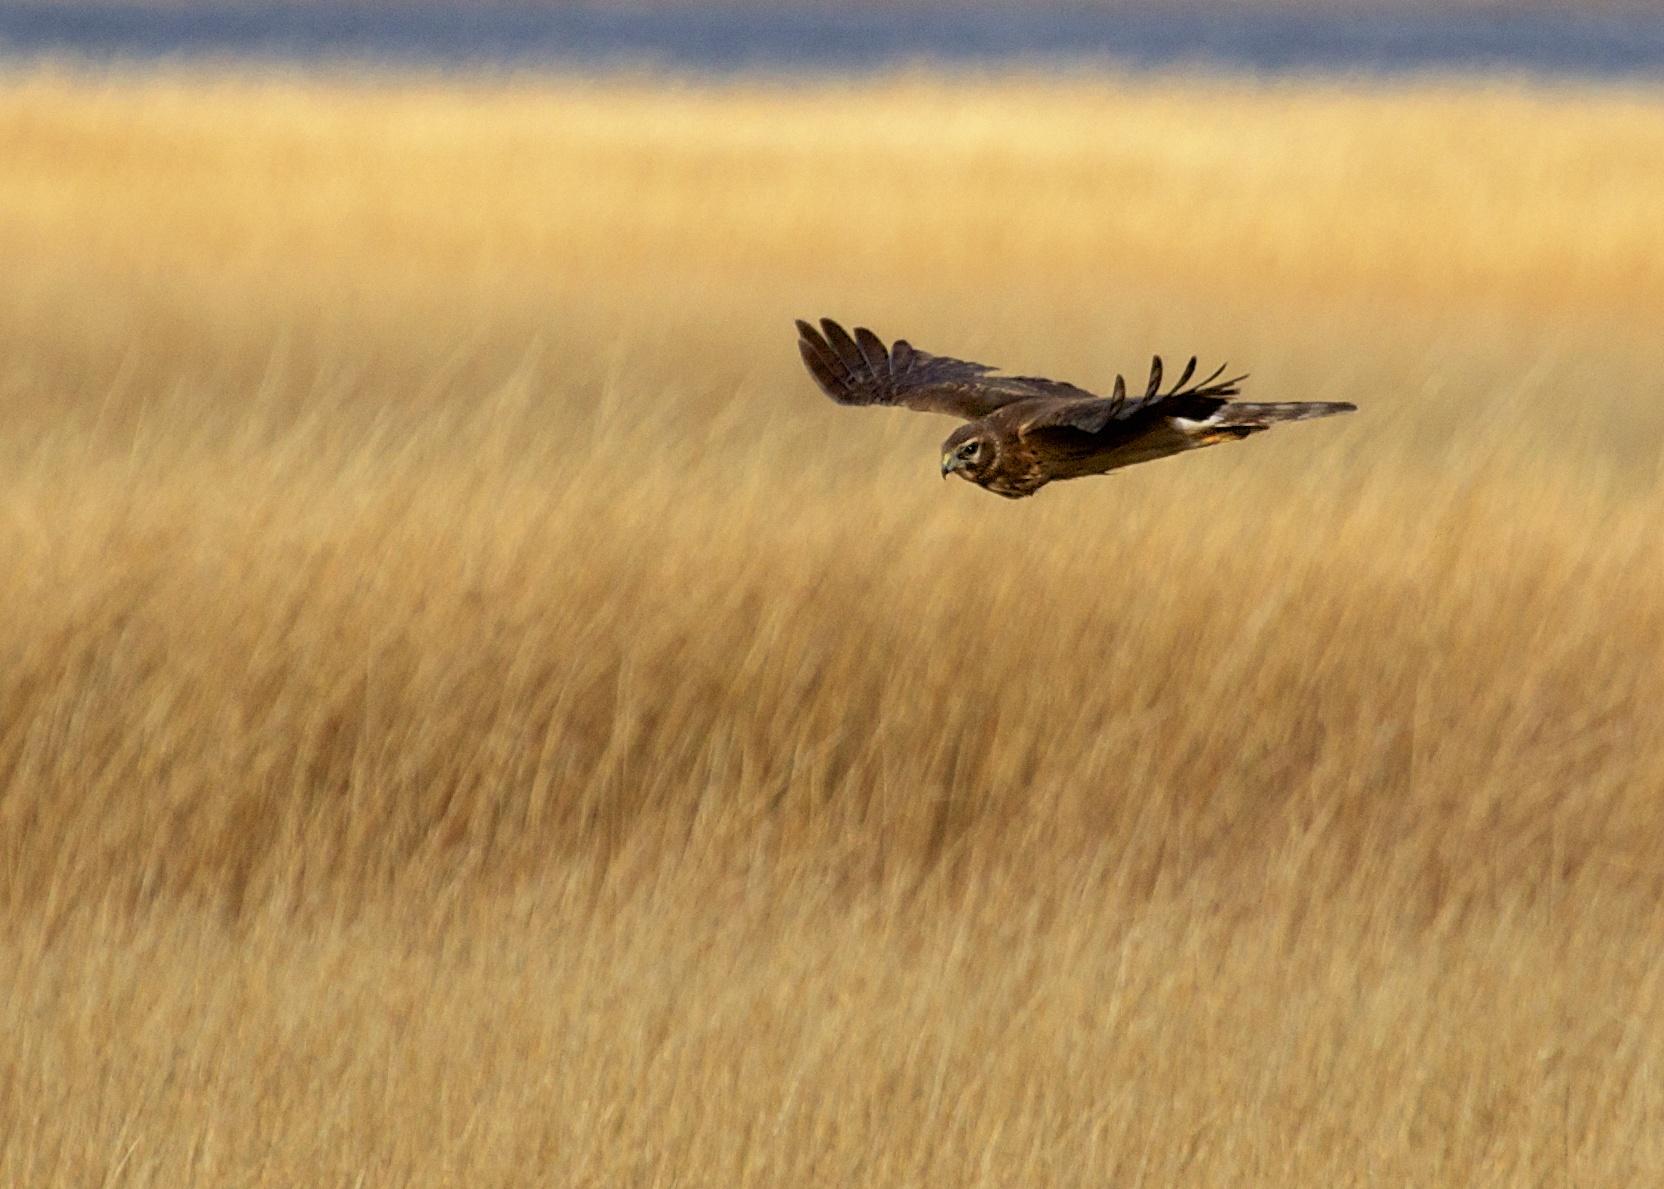 Nothern Harrier, I think this bird was at Oak Beach, 12/15/13.